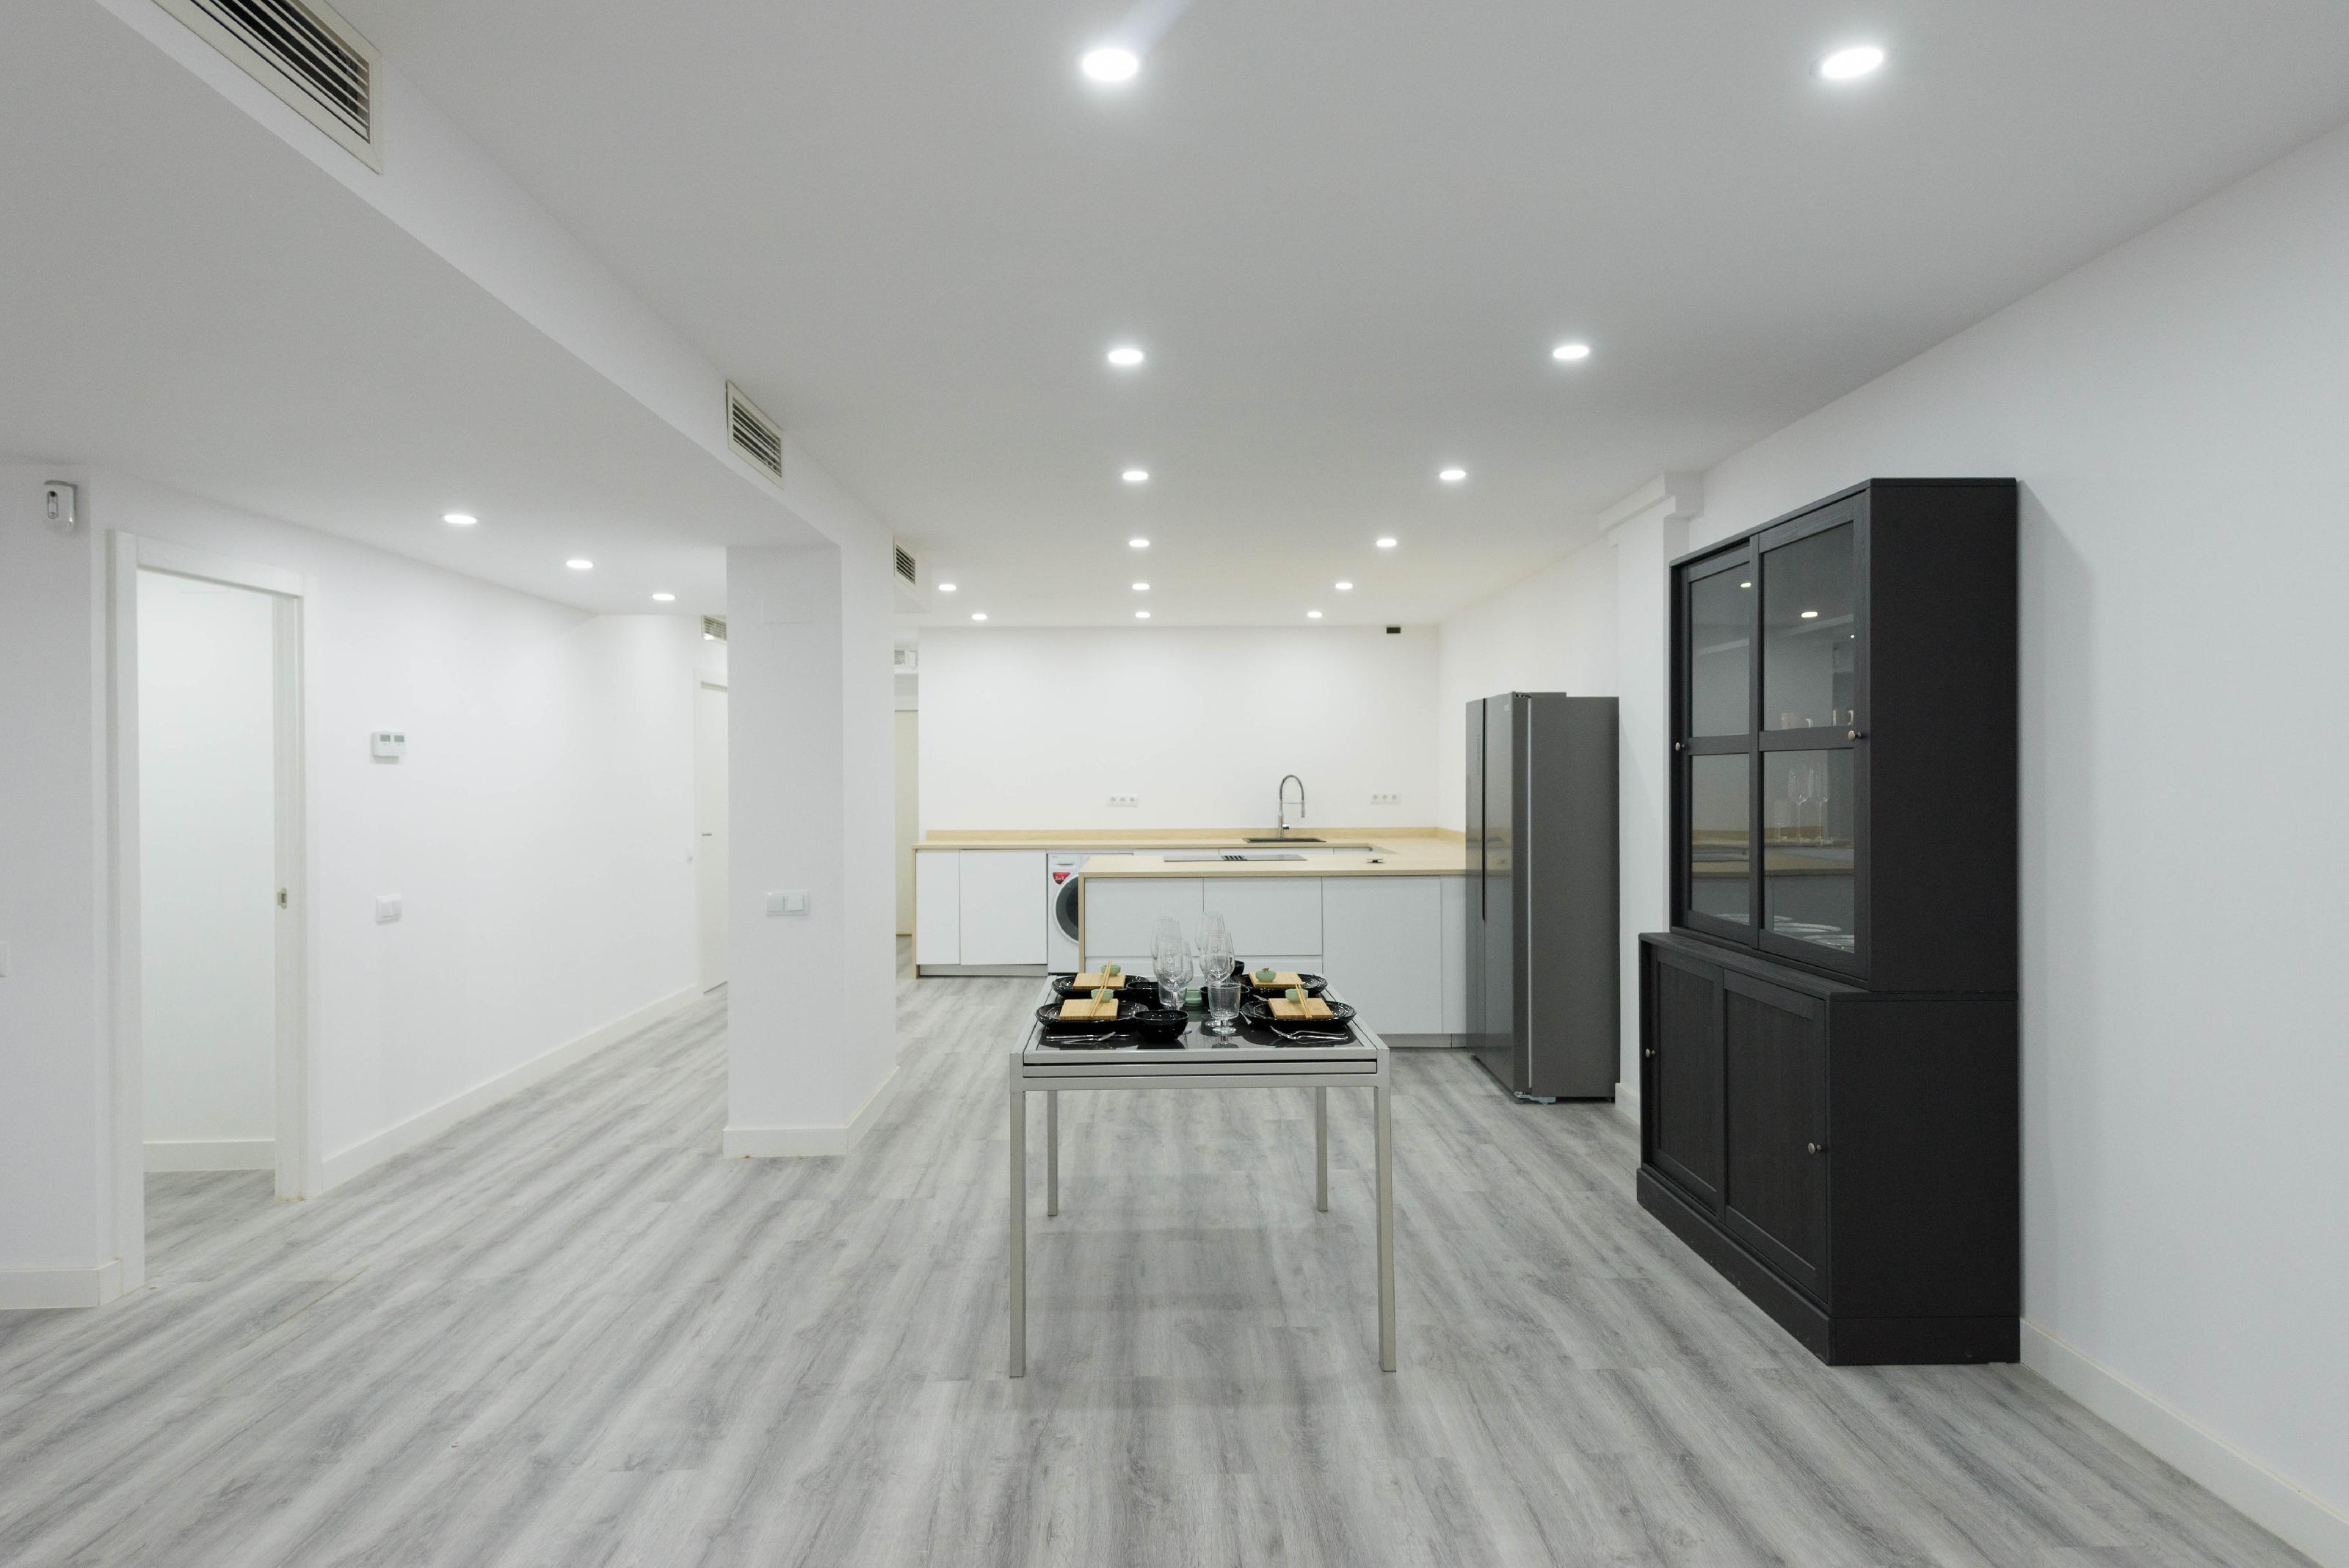 242980 Flat for sale in Eixample, Sagrada Familia 12